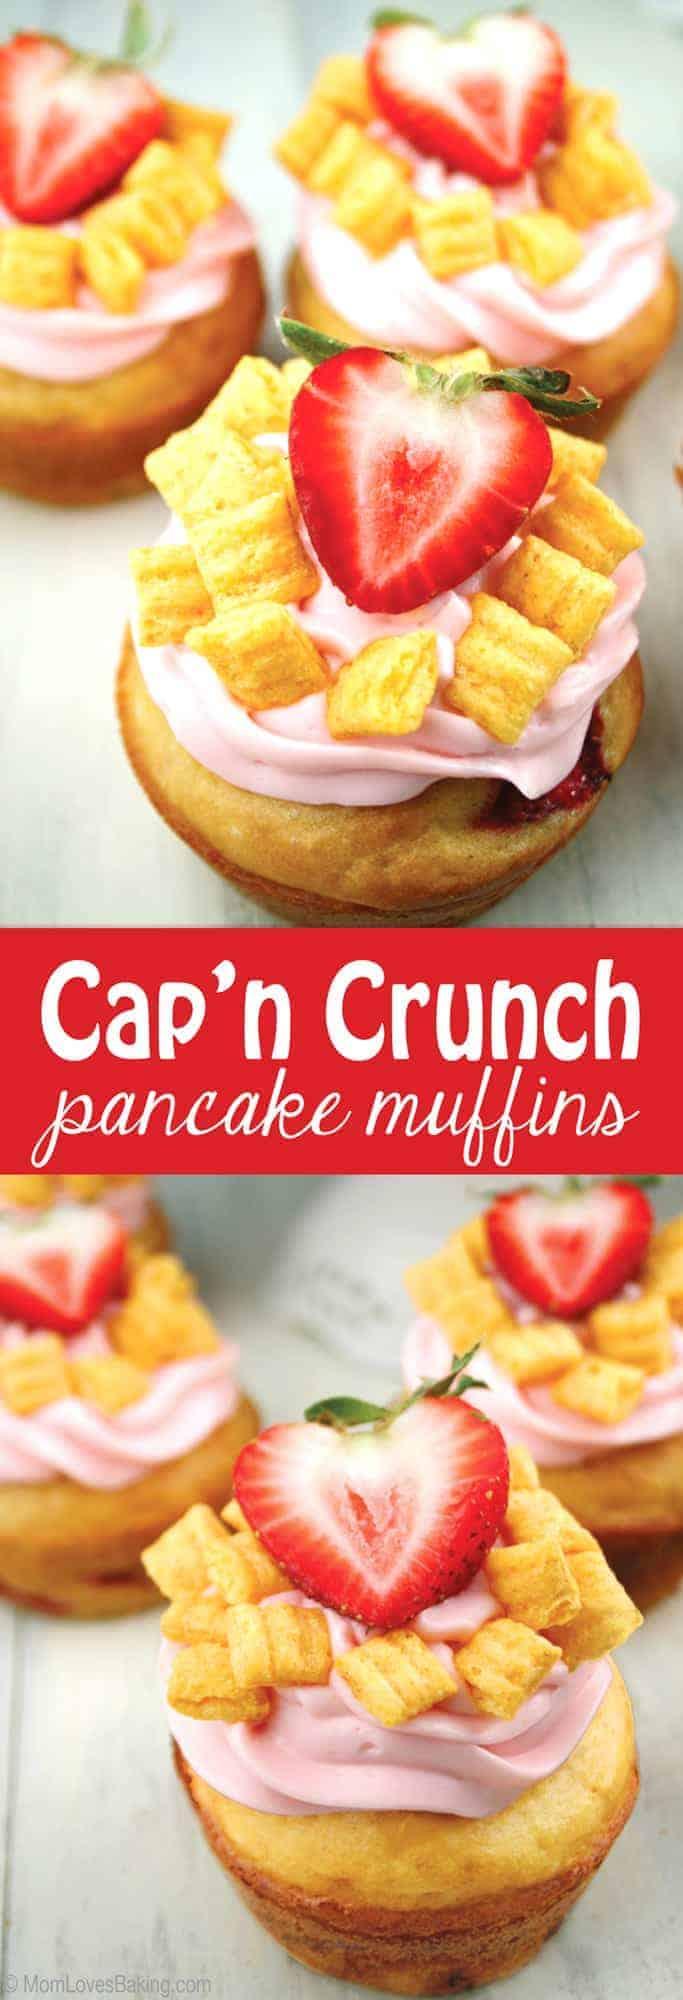 Capn-Crunch-Pancake-Muffins-Long